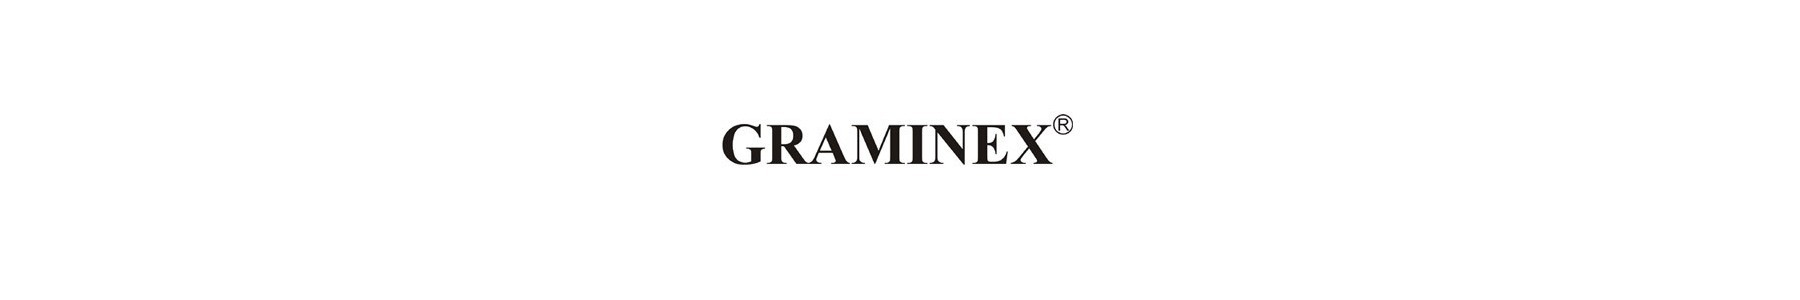 Graminex